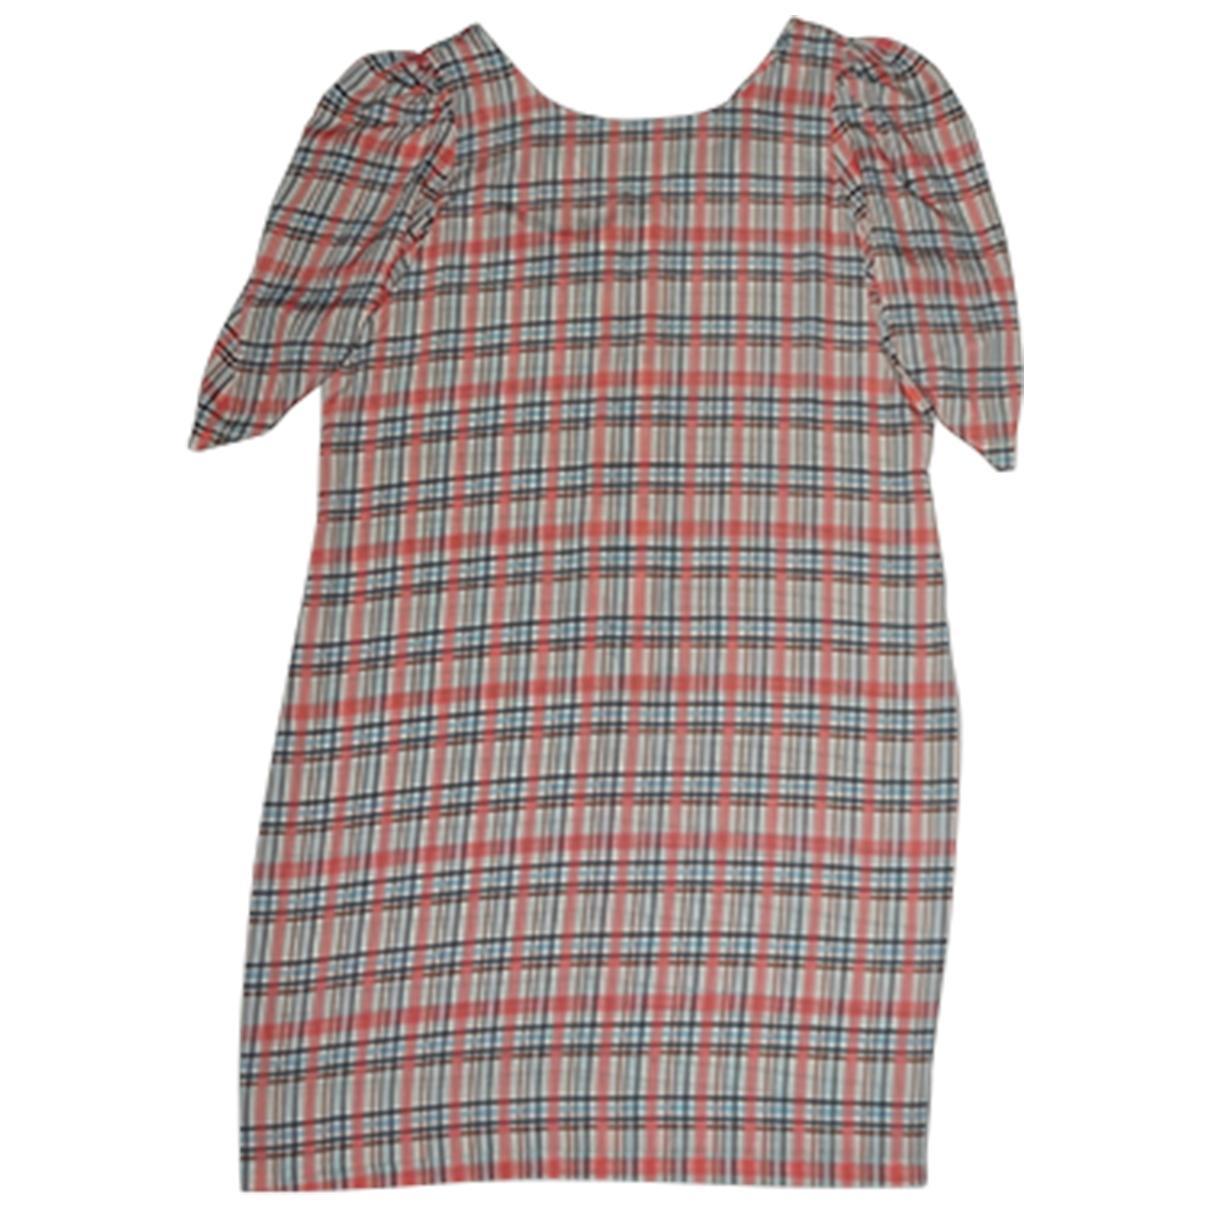 Tara Jarmon - Robe   pour femme - multicolore